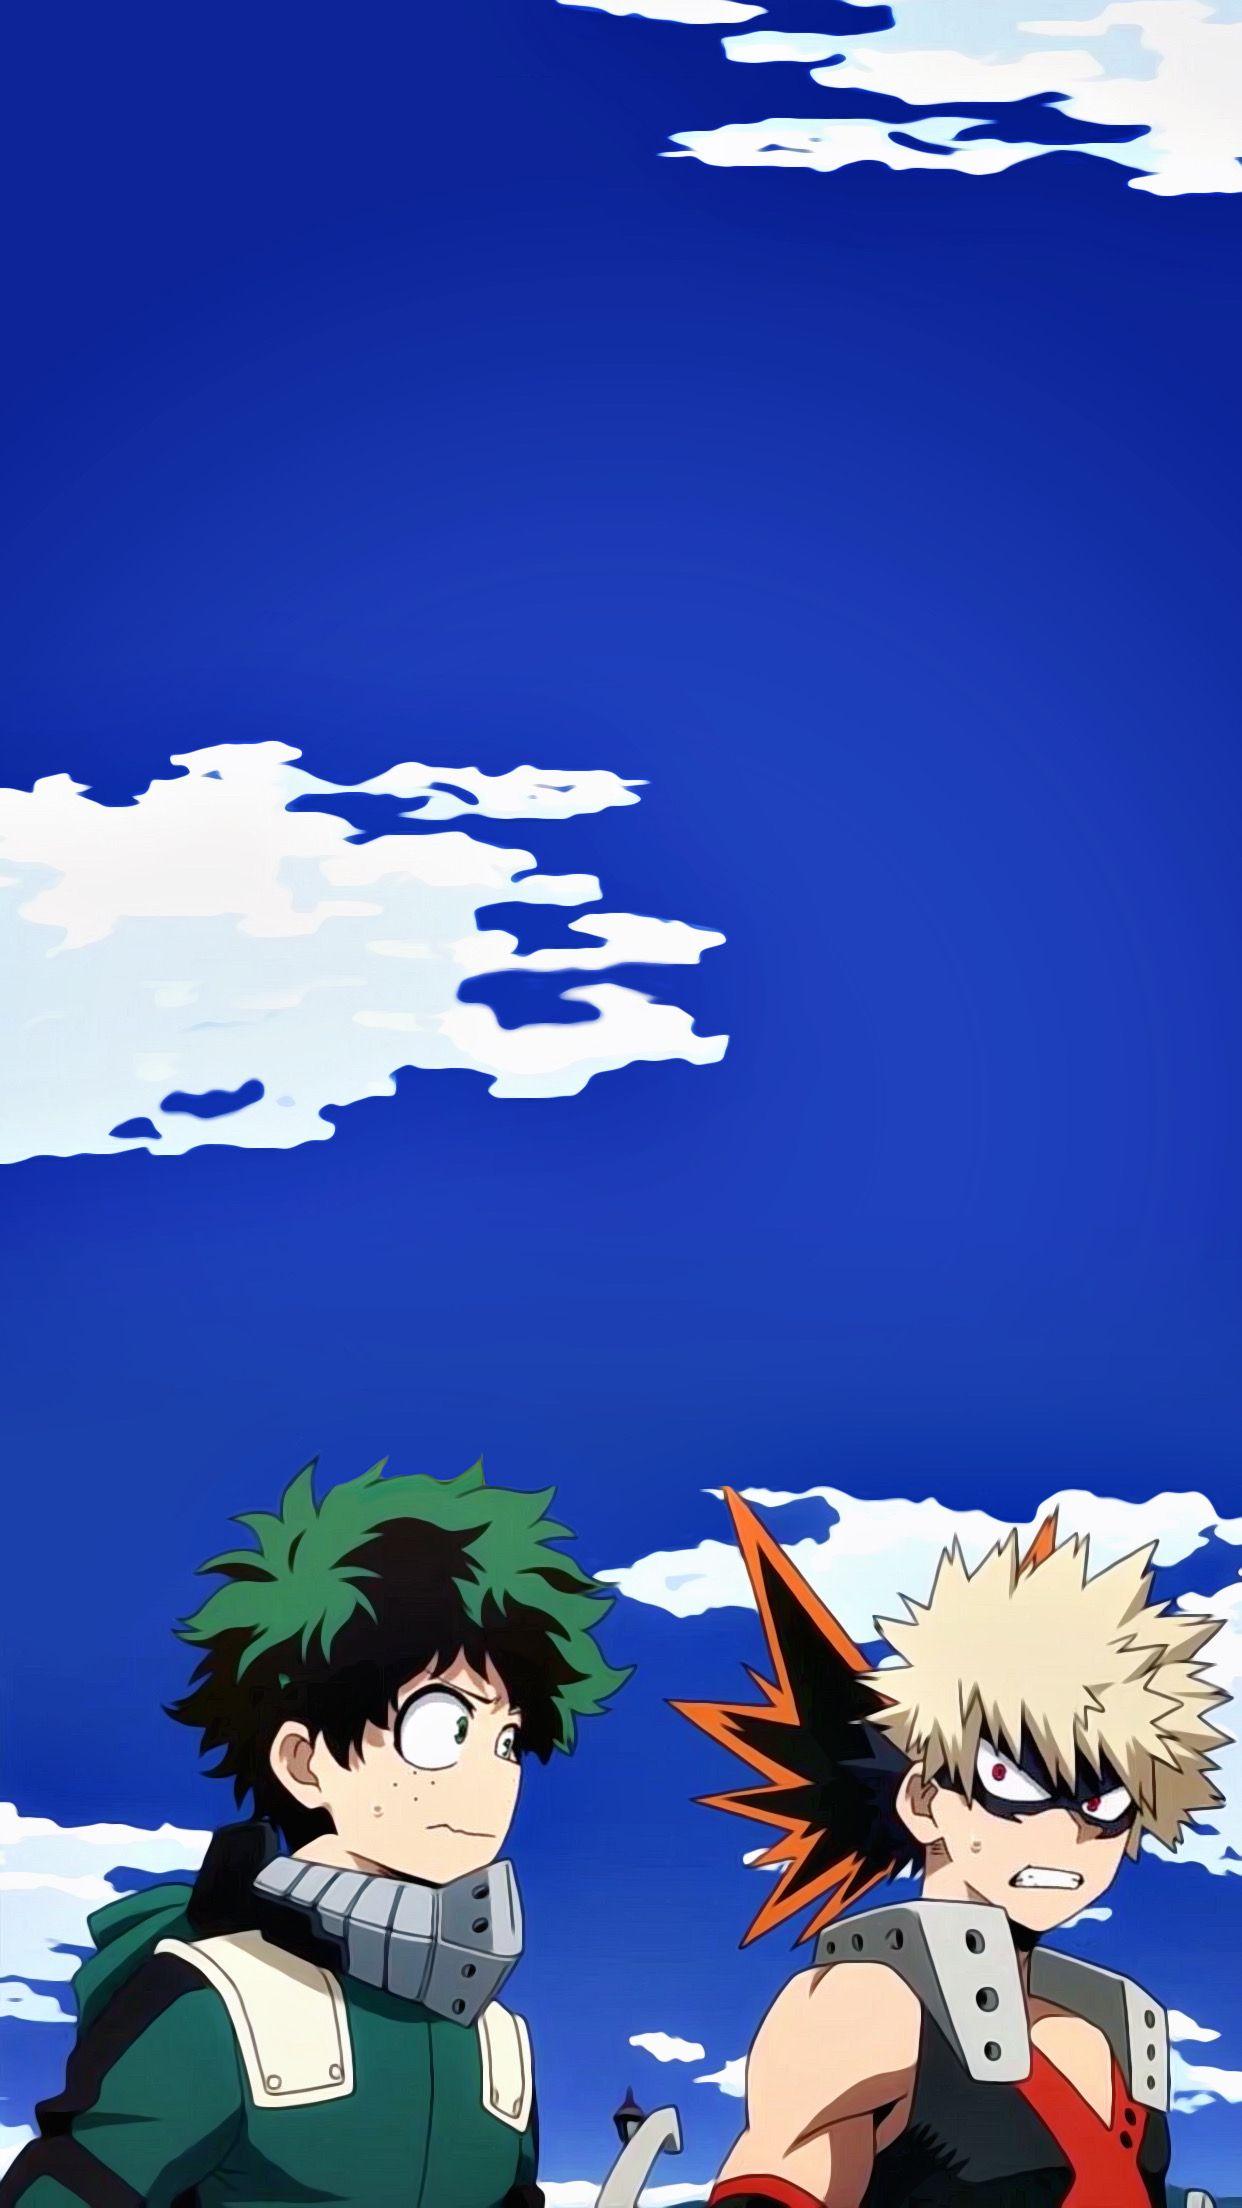 Deku Kacchan Hero Wallpaper Anime Villians Cute Anime Wallpaper